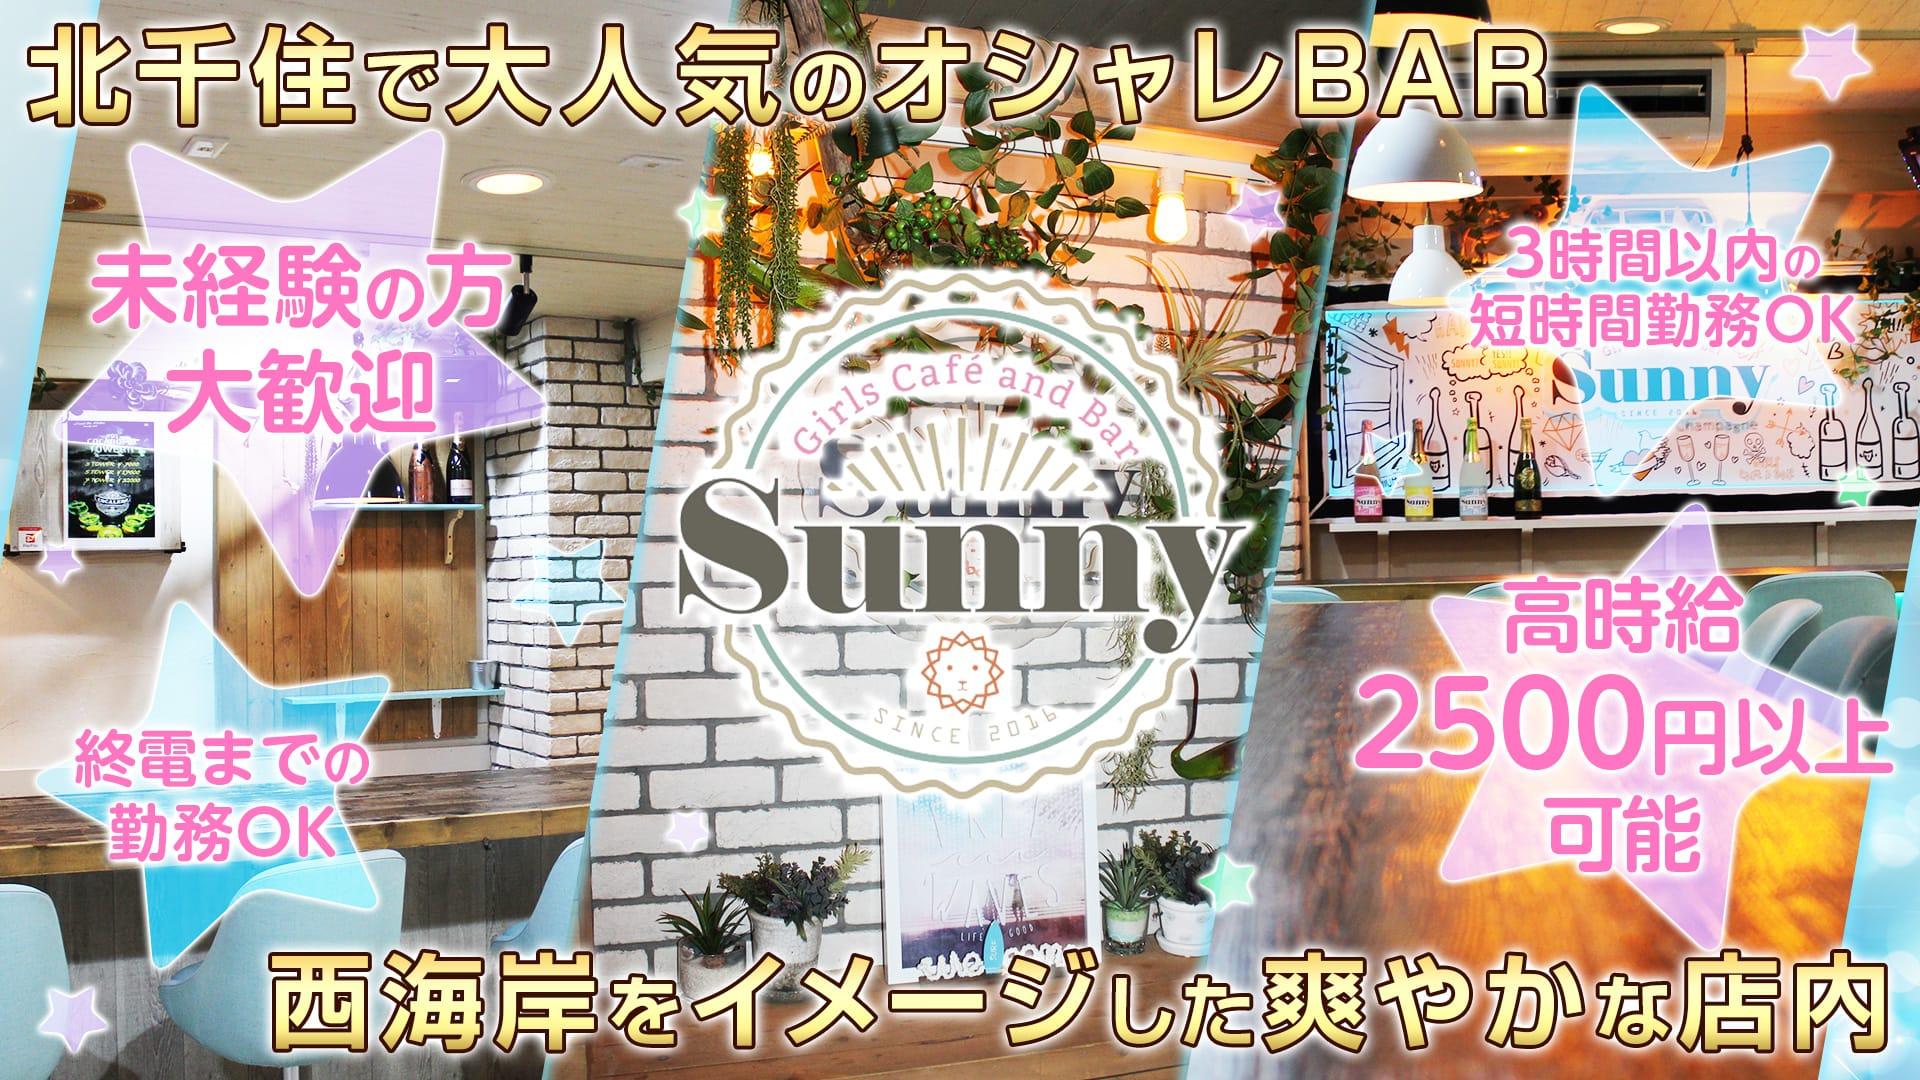 Girls cafe and Bar Sunny(ガールズカフェアンドバーサニー) 北千住ガールズバー TOP画像